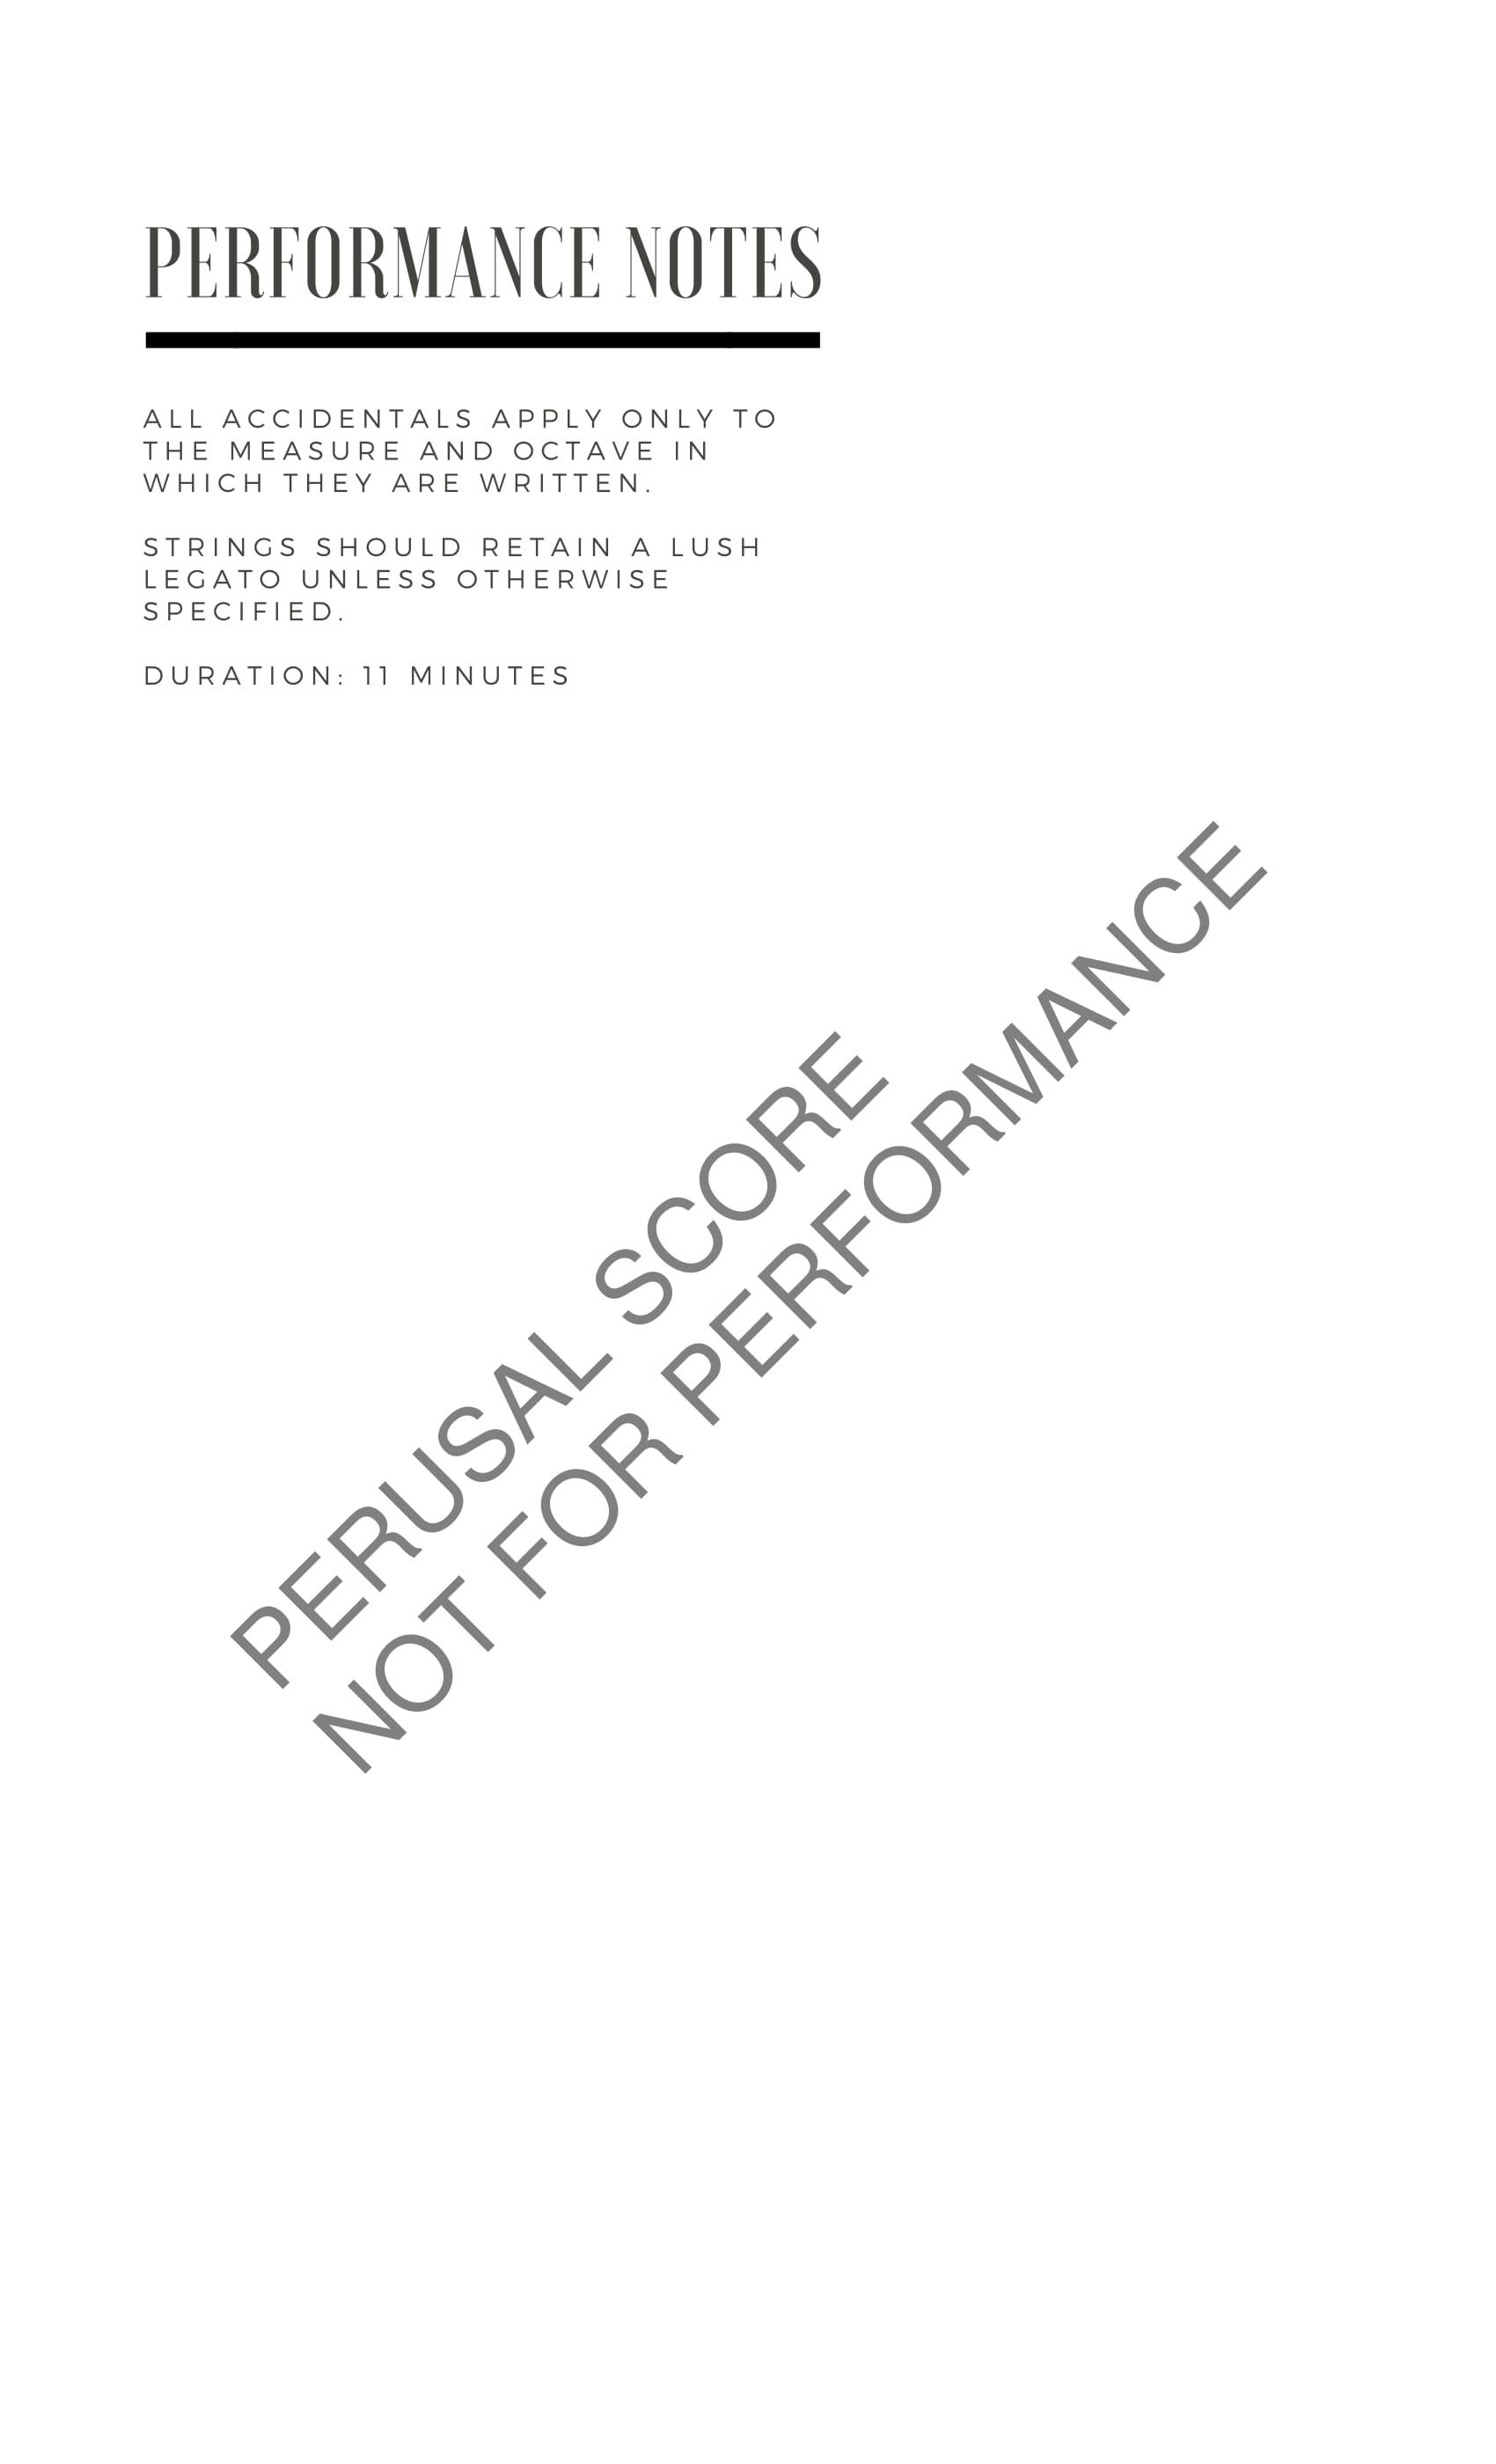 Boyd HouseofFountains Score-watermark-05.jpg